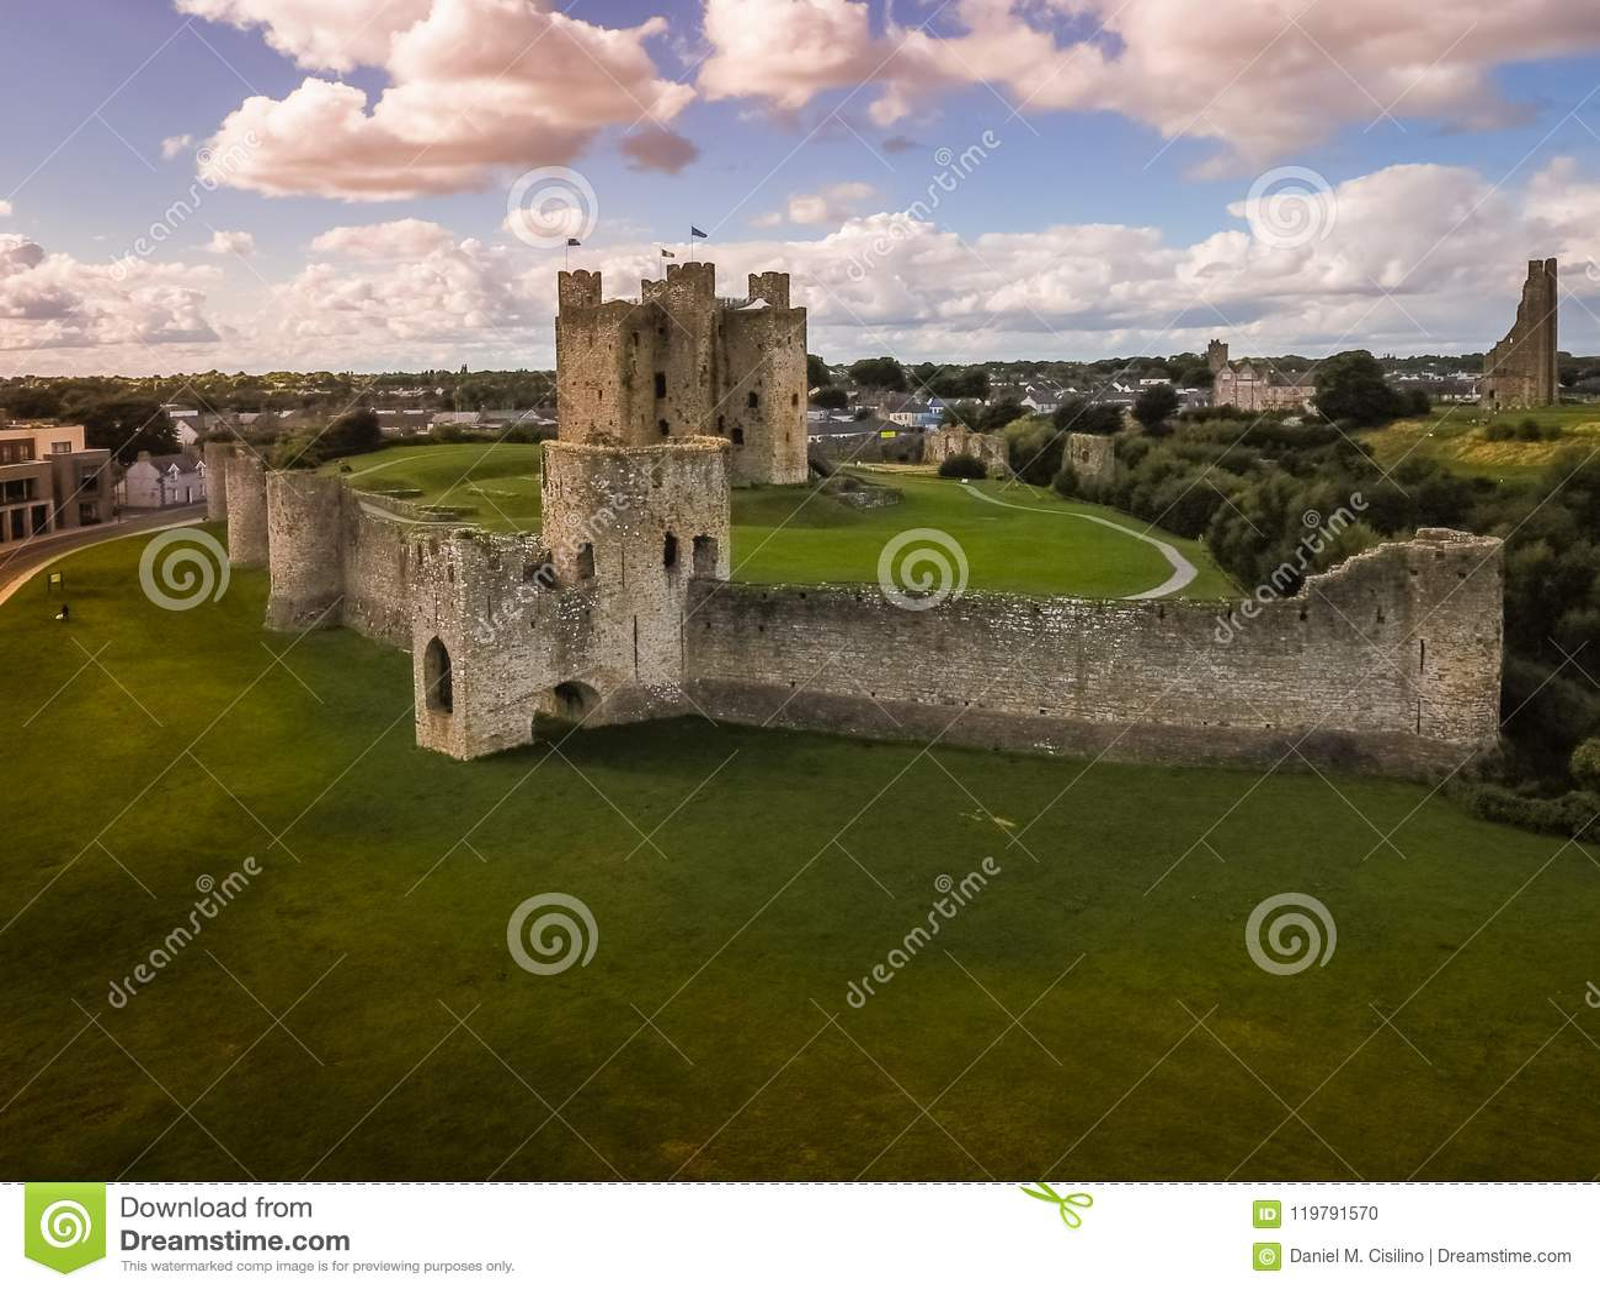 Aerial view. Trim Castle. county Meath. Ireland